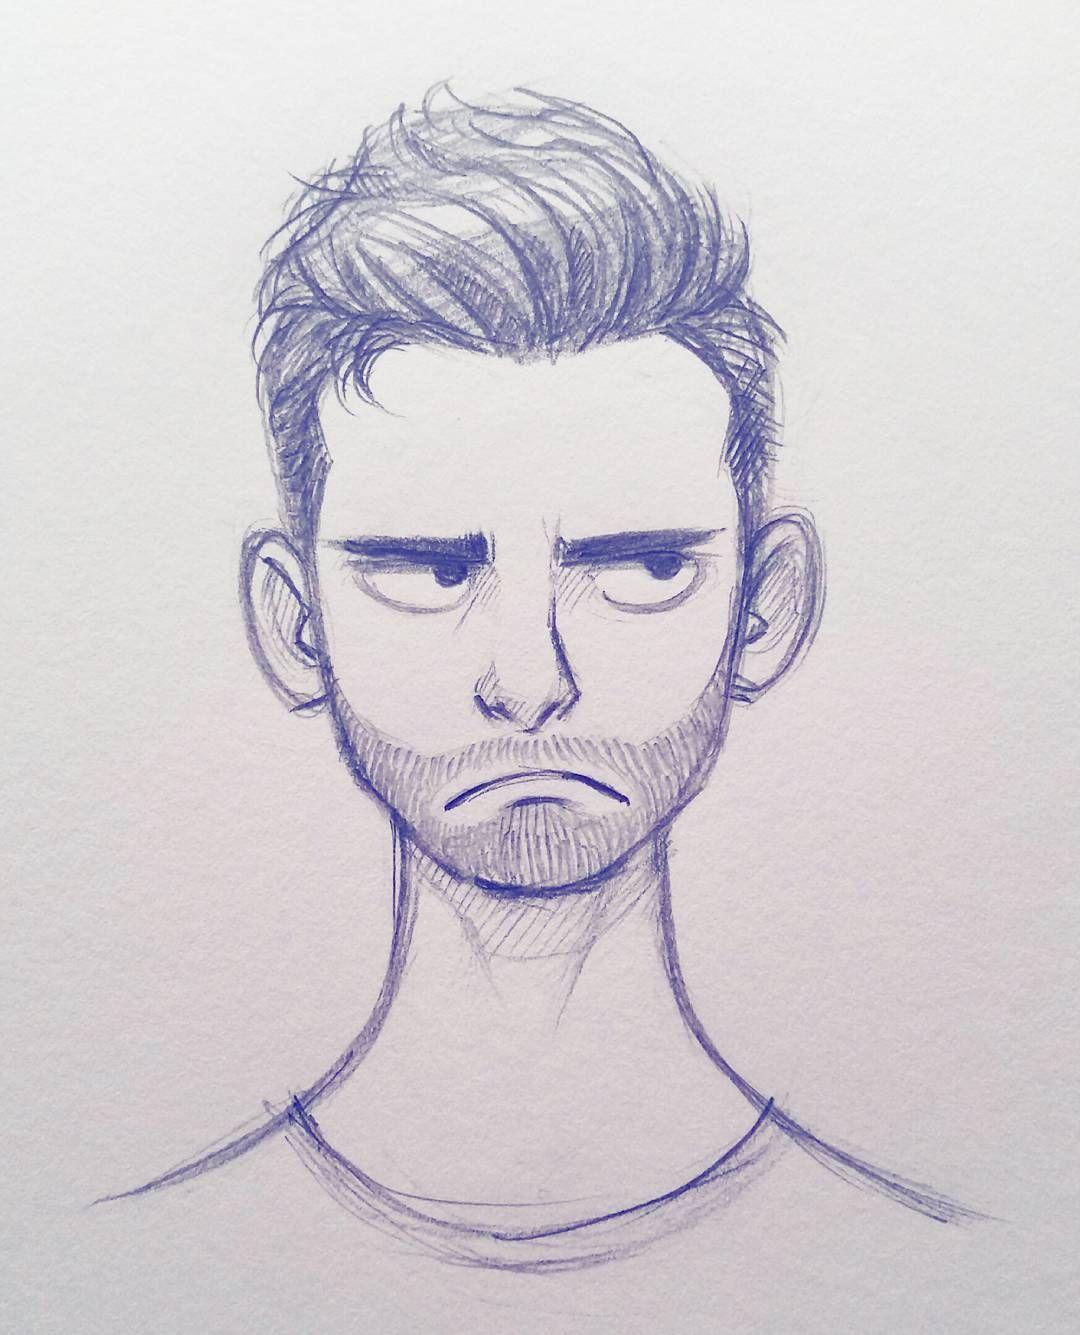 Cameron mark cartoon doodle pinterest doodle sketch for How to make doodle art